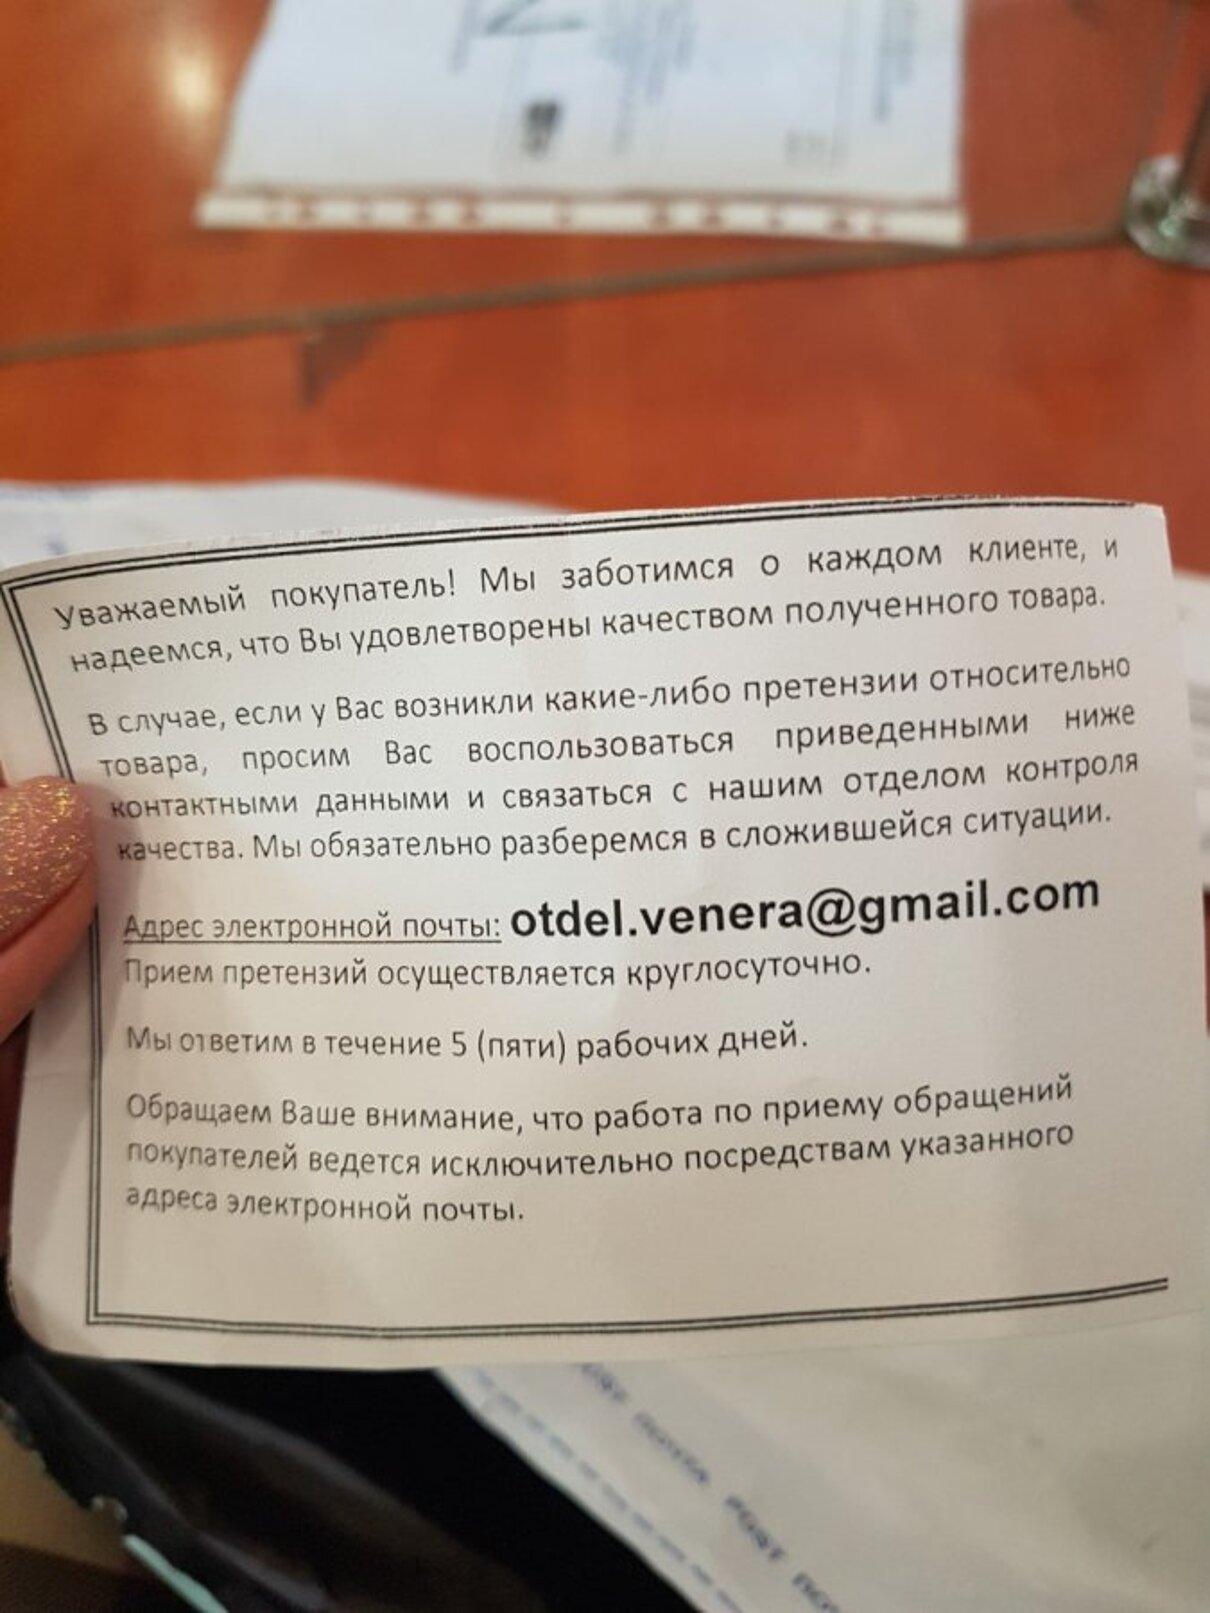 Жалоба-отзыв: Кукла-блайз.рф - Мошенники.  Фото №3